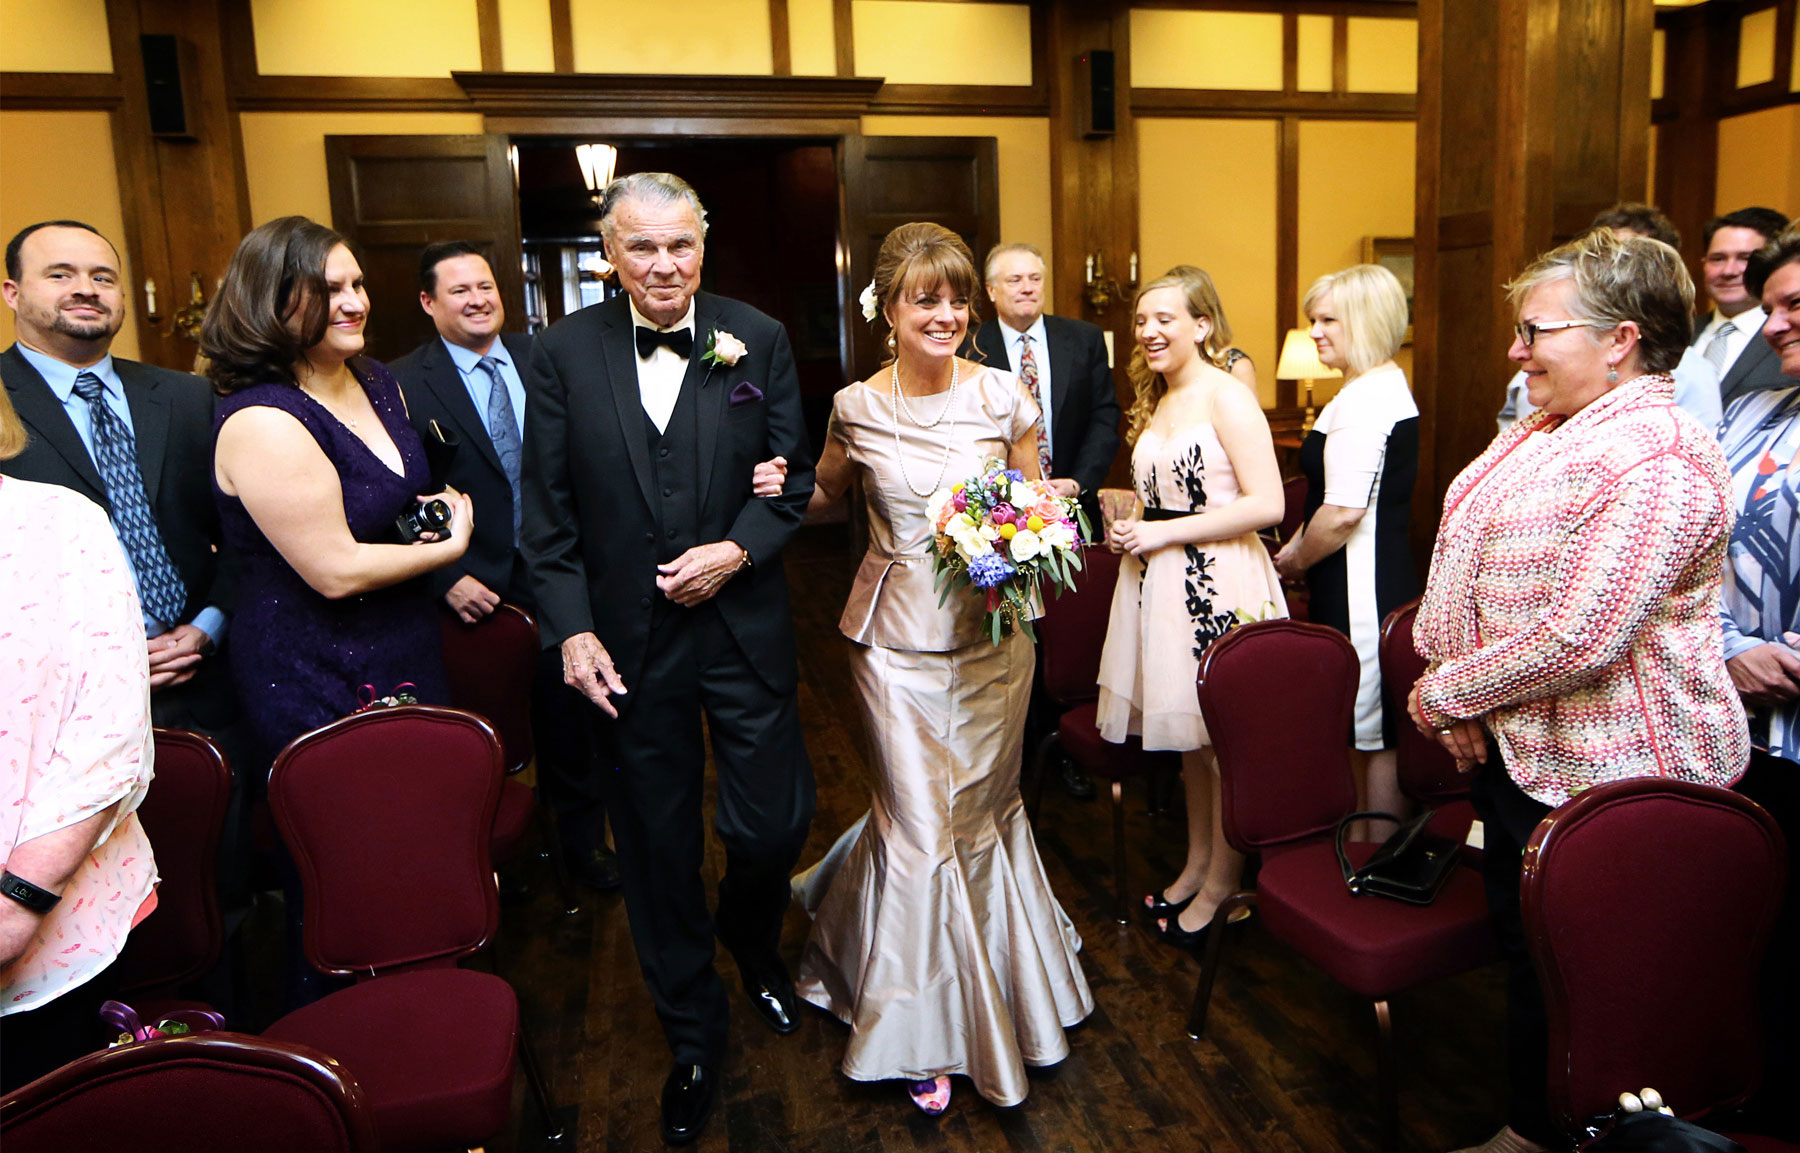 06-Minneapolis-Minnesota-Wedding-Photography-by-Vick-Photography-Downtown-The-Minneapolis-Club-Mansion-Ceremony-Tonia-and-Paul.jpg